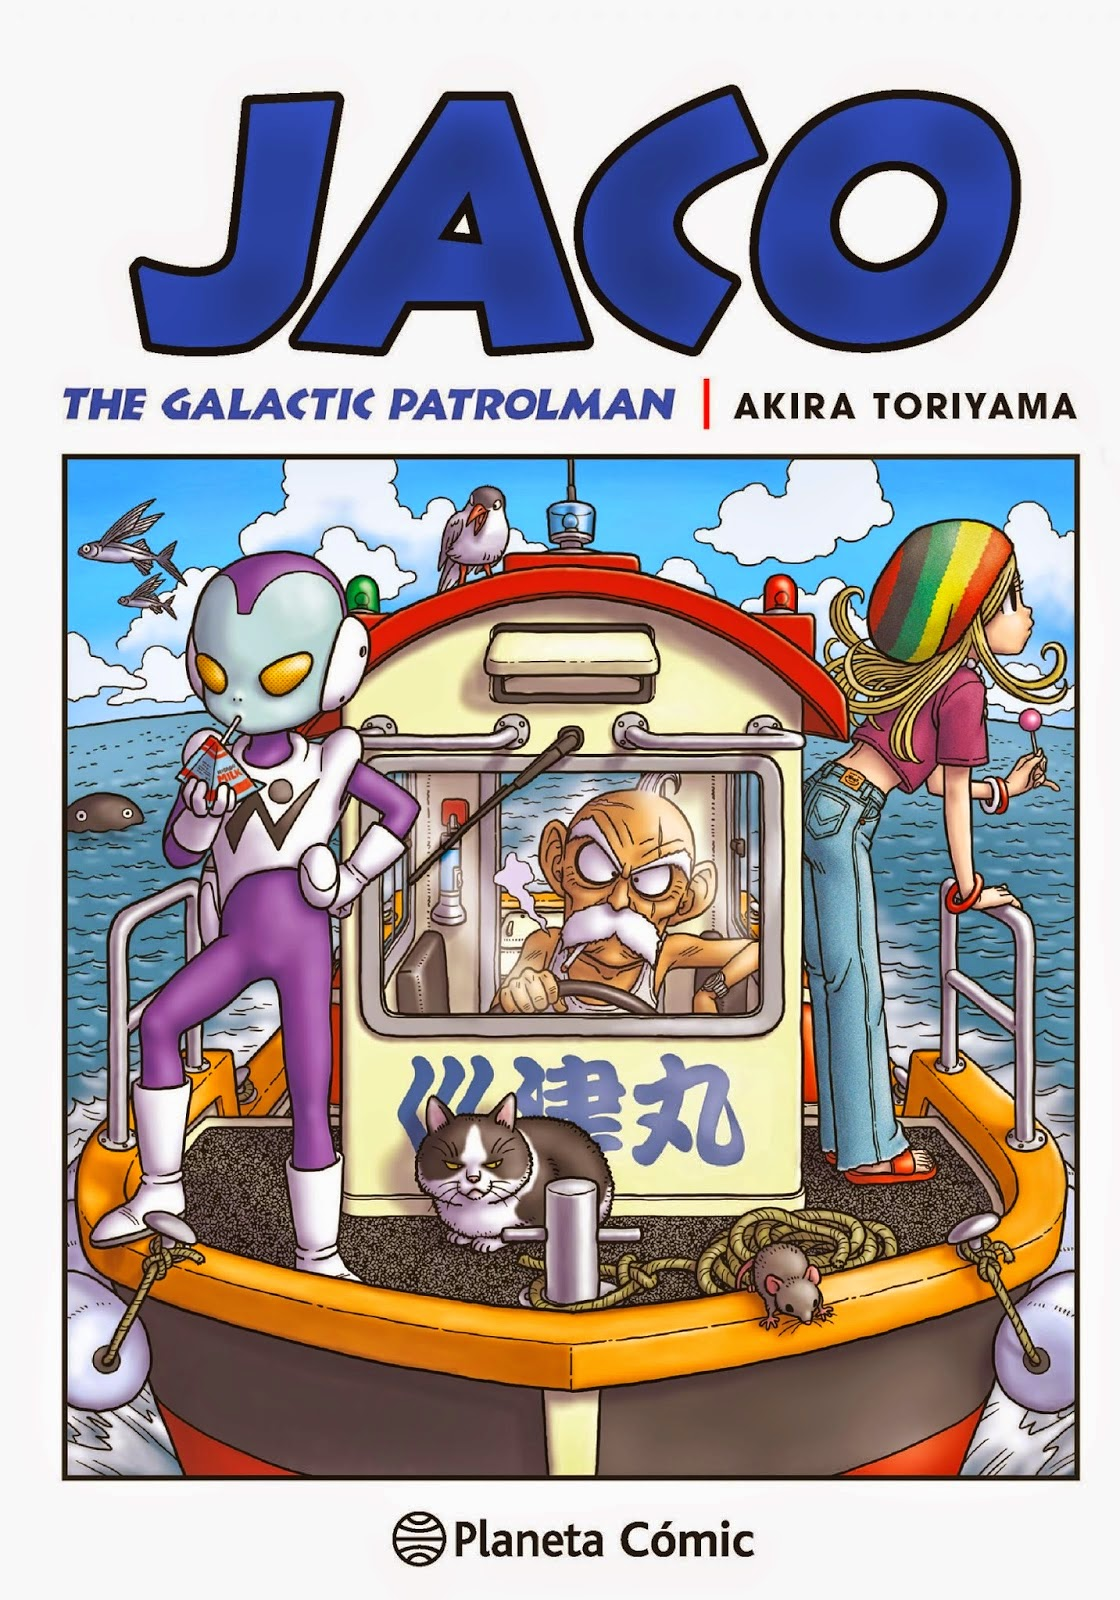 """Jaco, the galactic patrolman"" - Akira Toriyama, 2013"